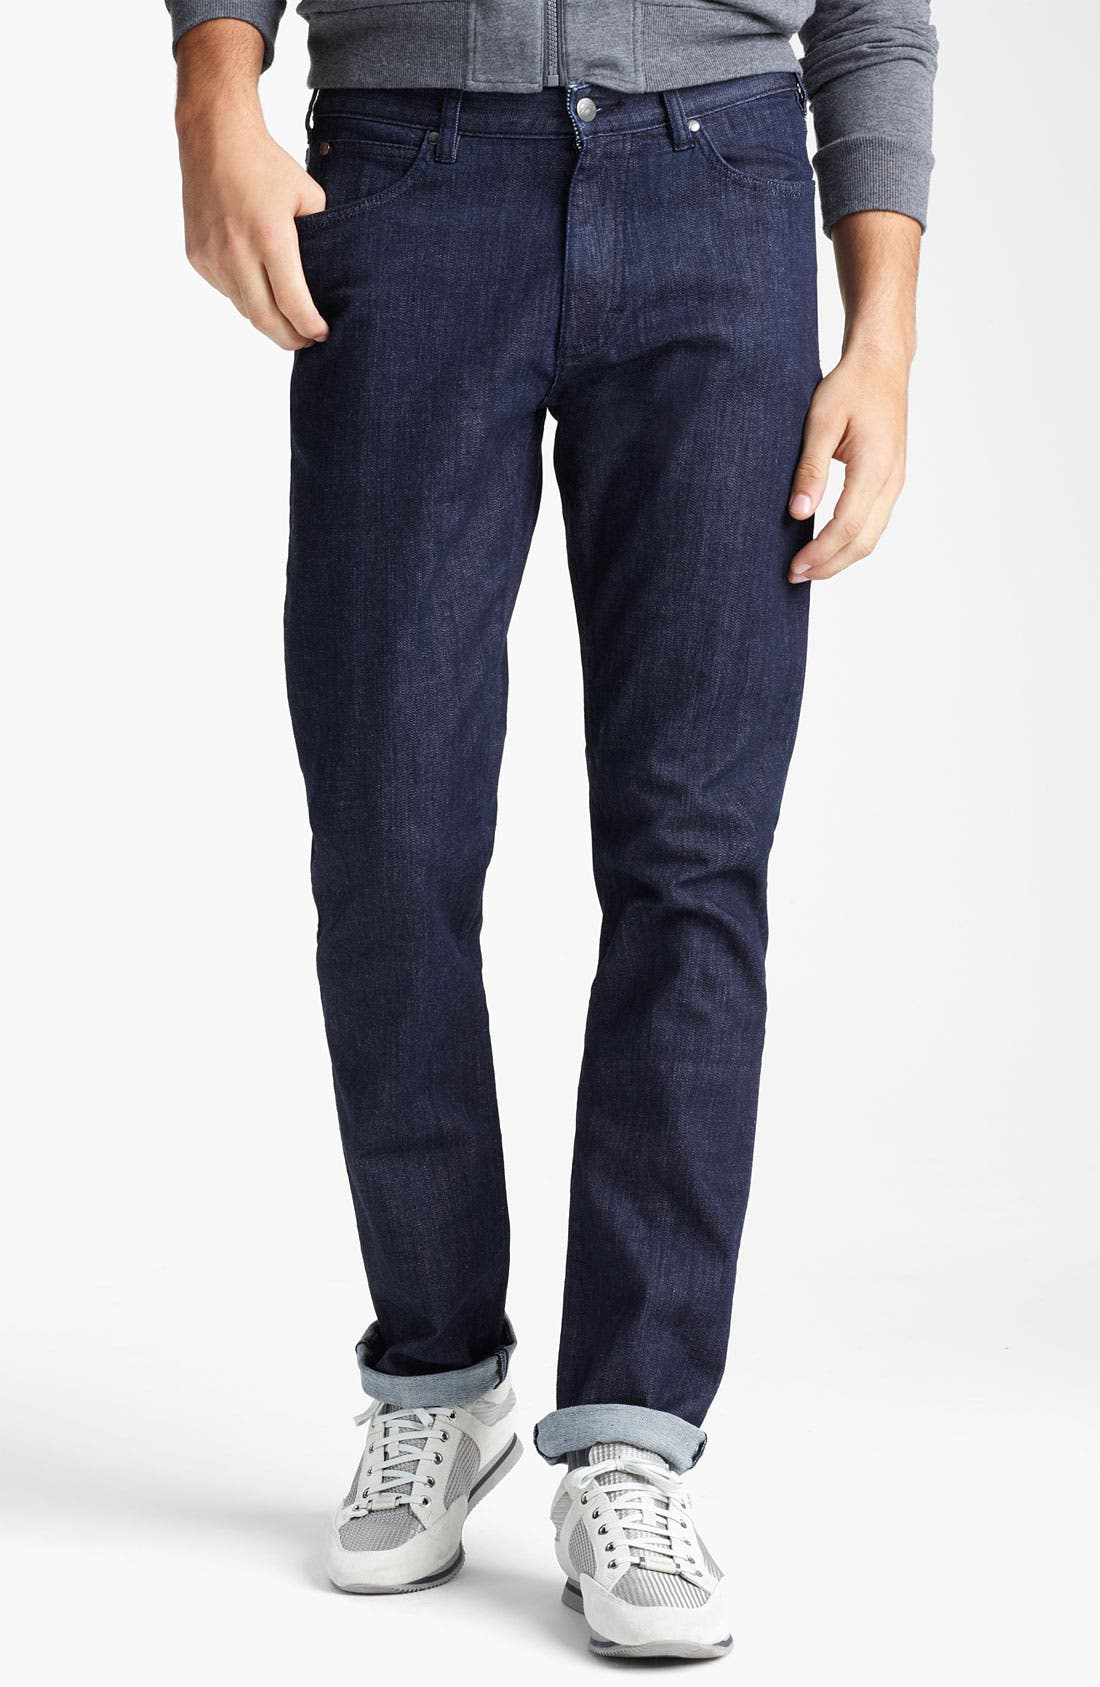 Alternate Image 1 Selected - Zegna Sport Straight Leg Jeans